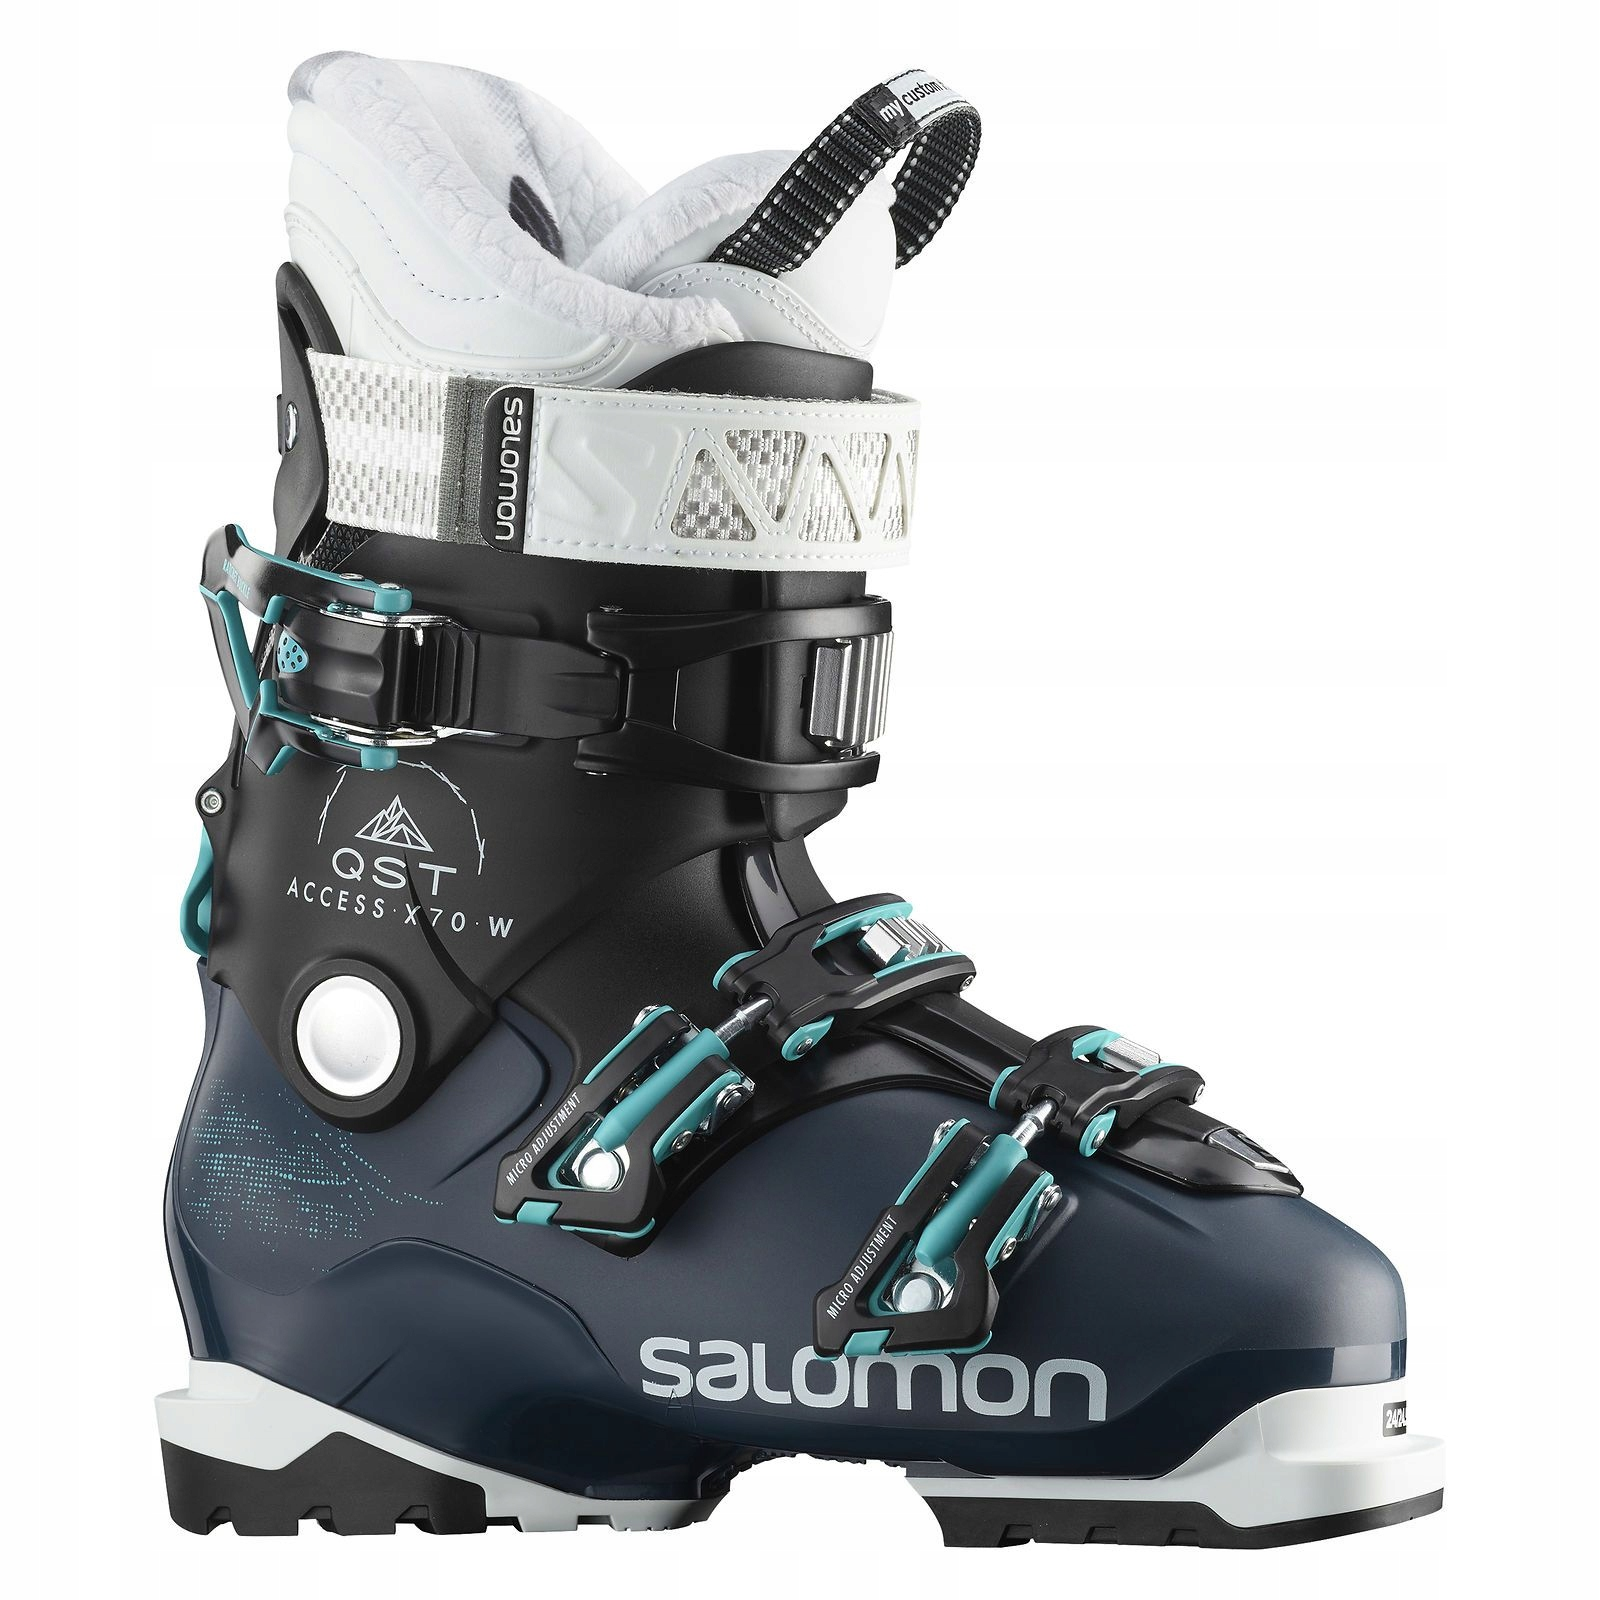 SALOMON QST ACCESS 80 buty narciarskie R. 26,5 cm :: Sklep